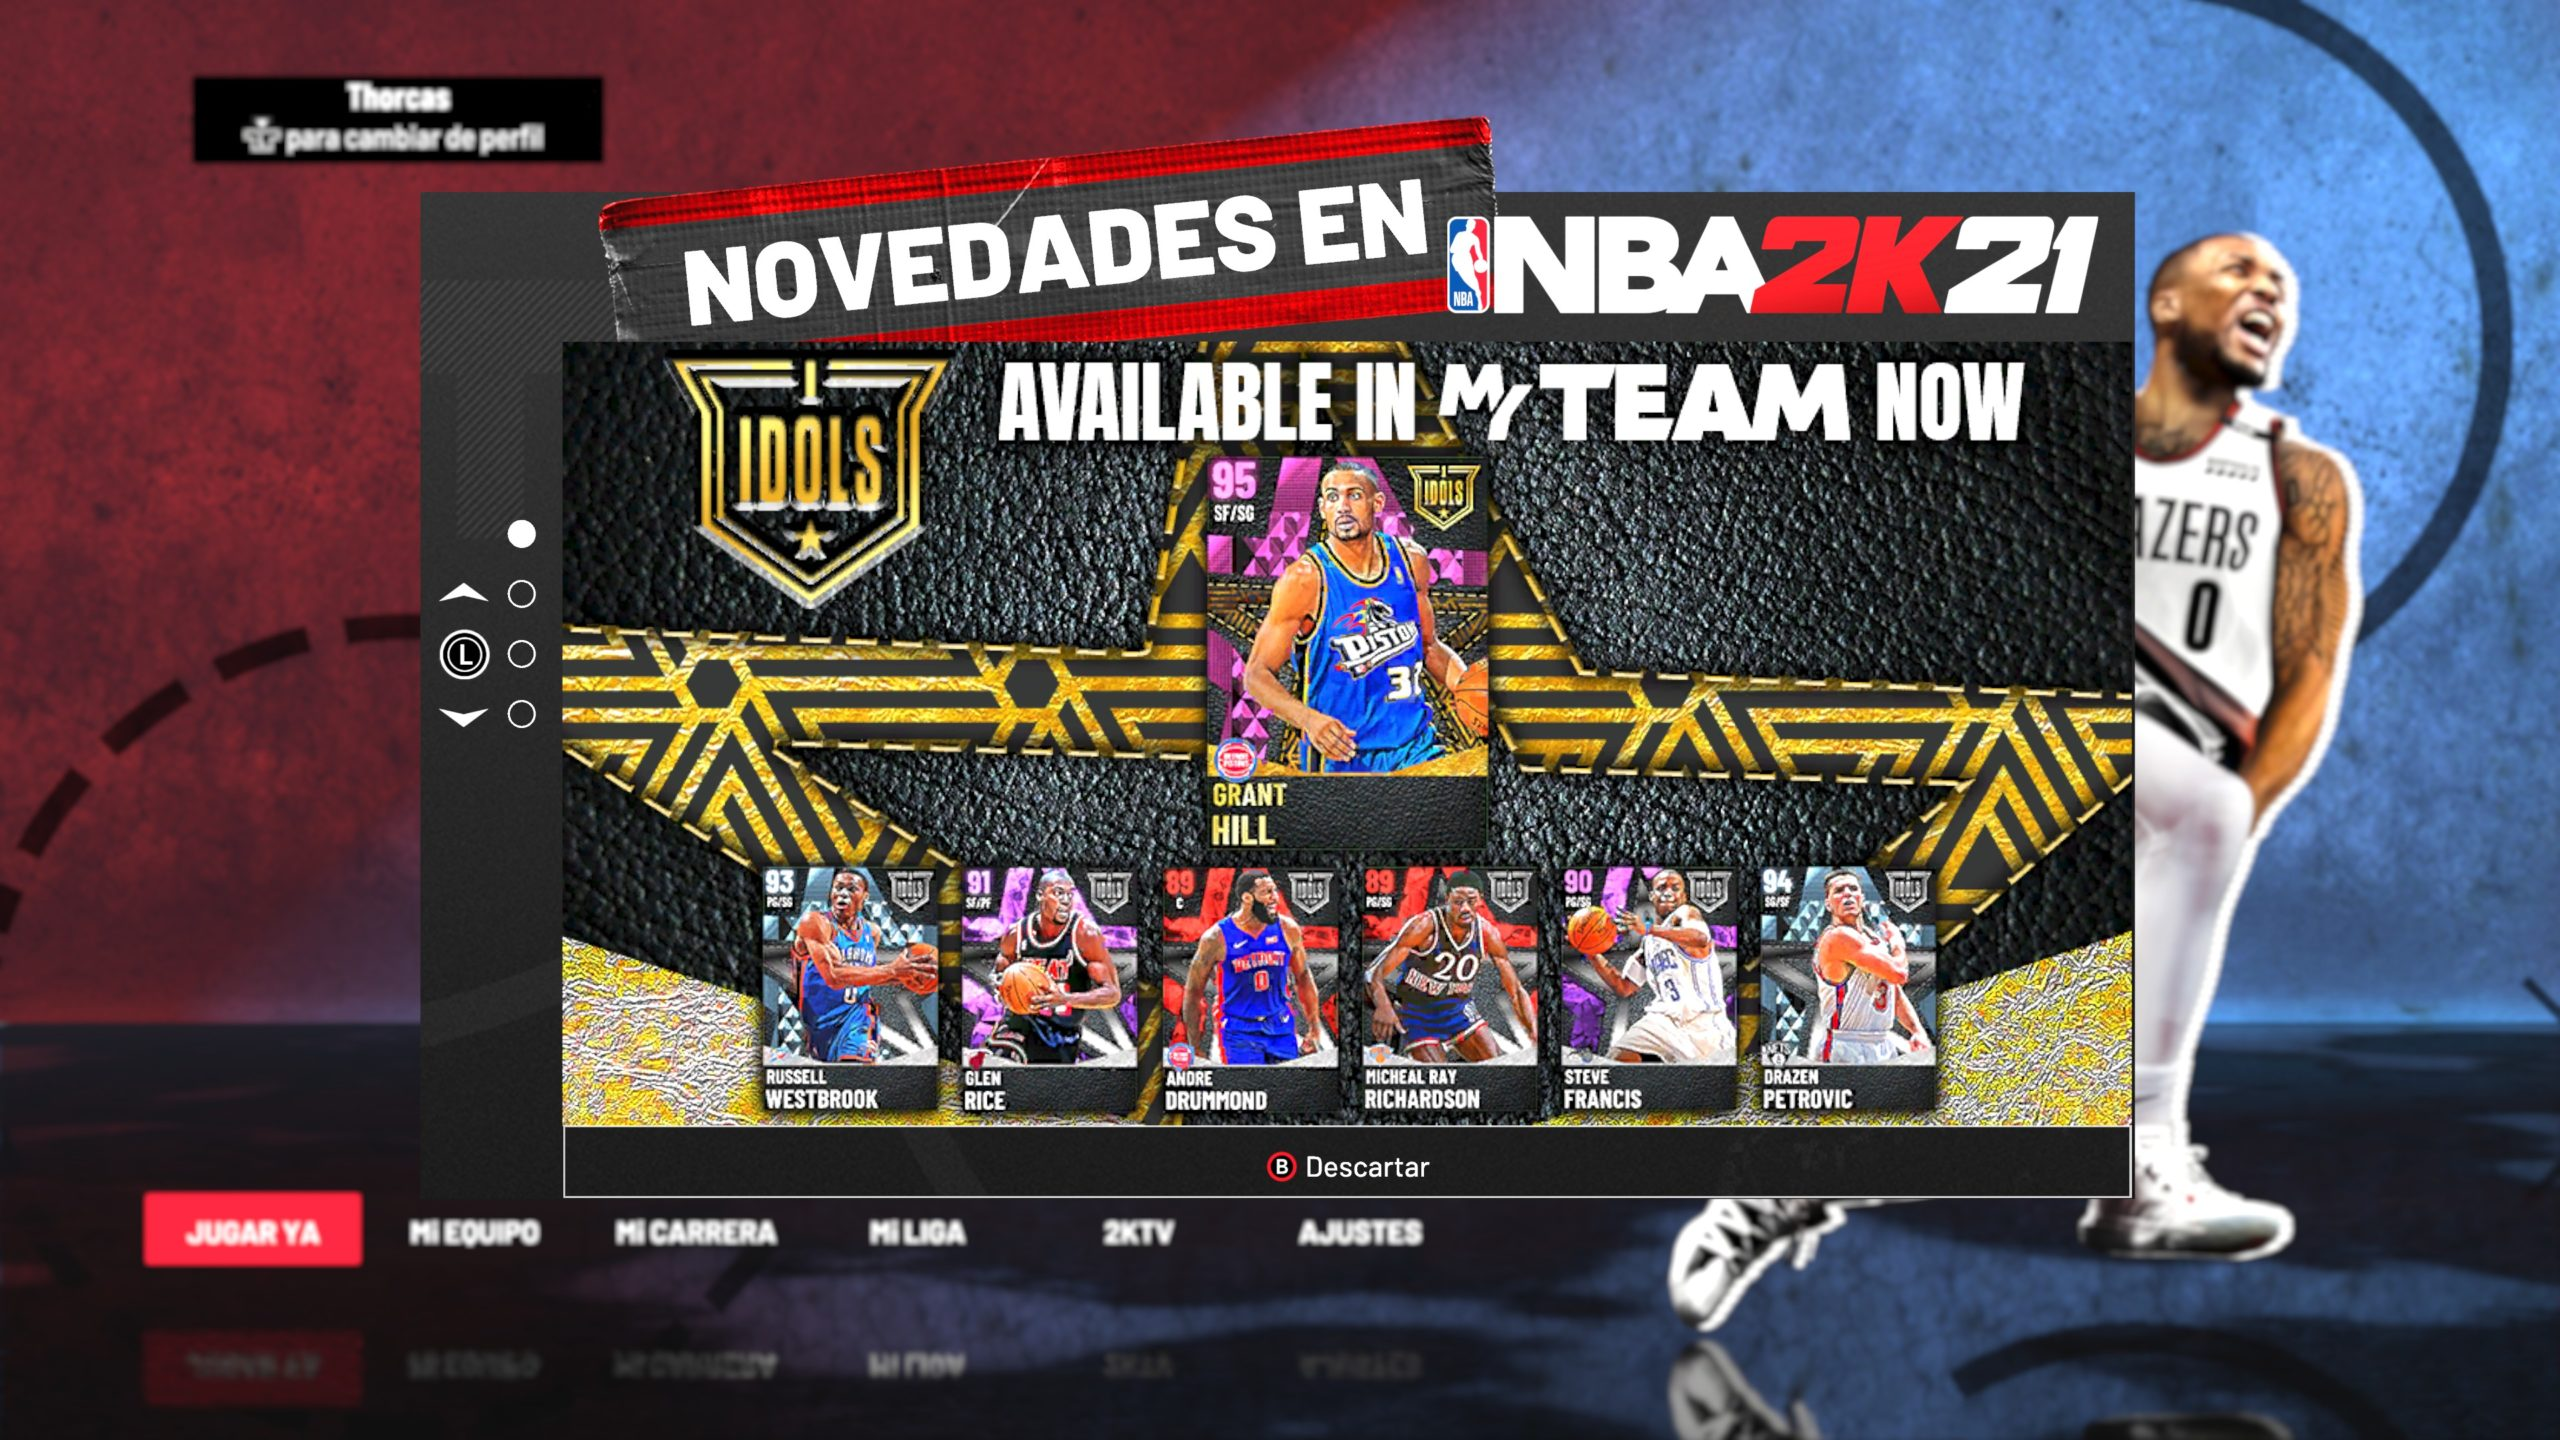 Nous analysons la NBA2K21 (Xbox One), grande salle de basket 40